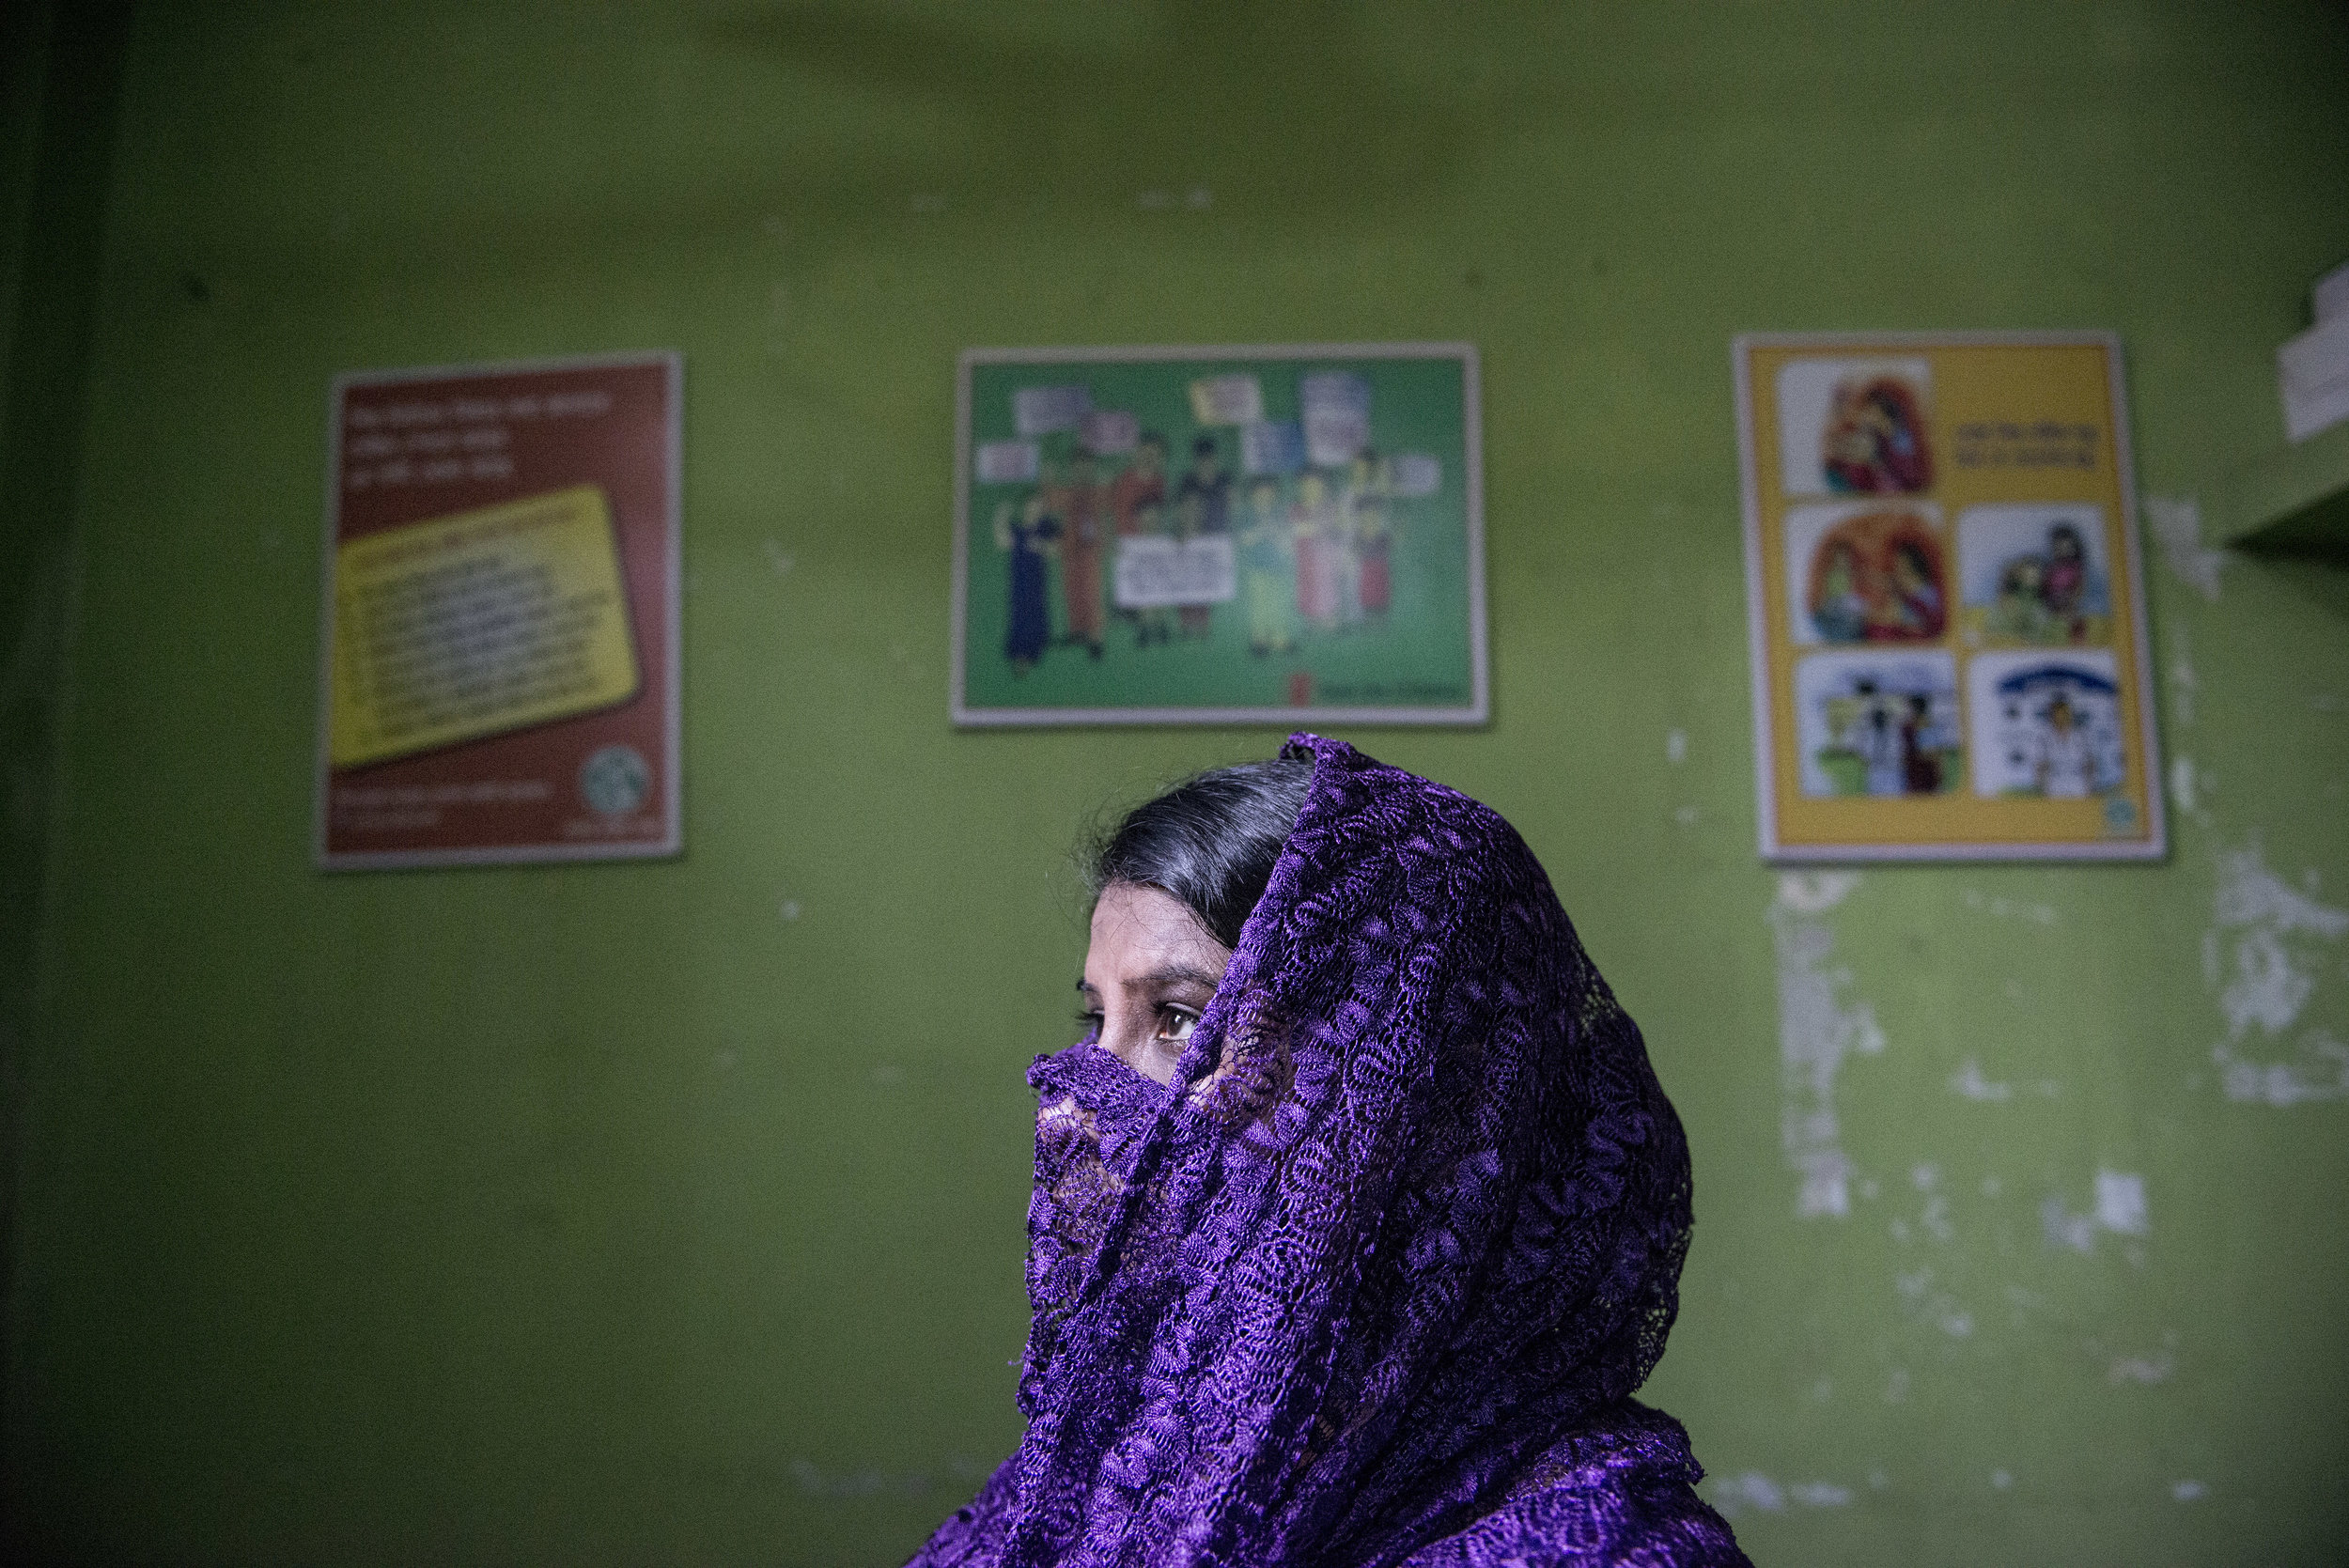 Brothel safe house. Faridpur, Bangladesh. 2014.